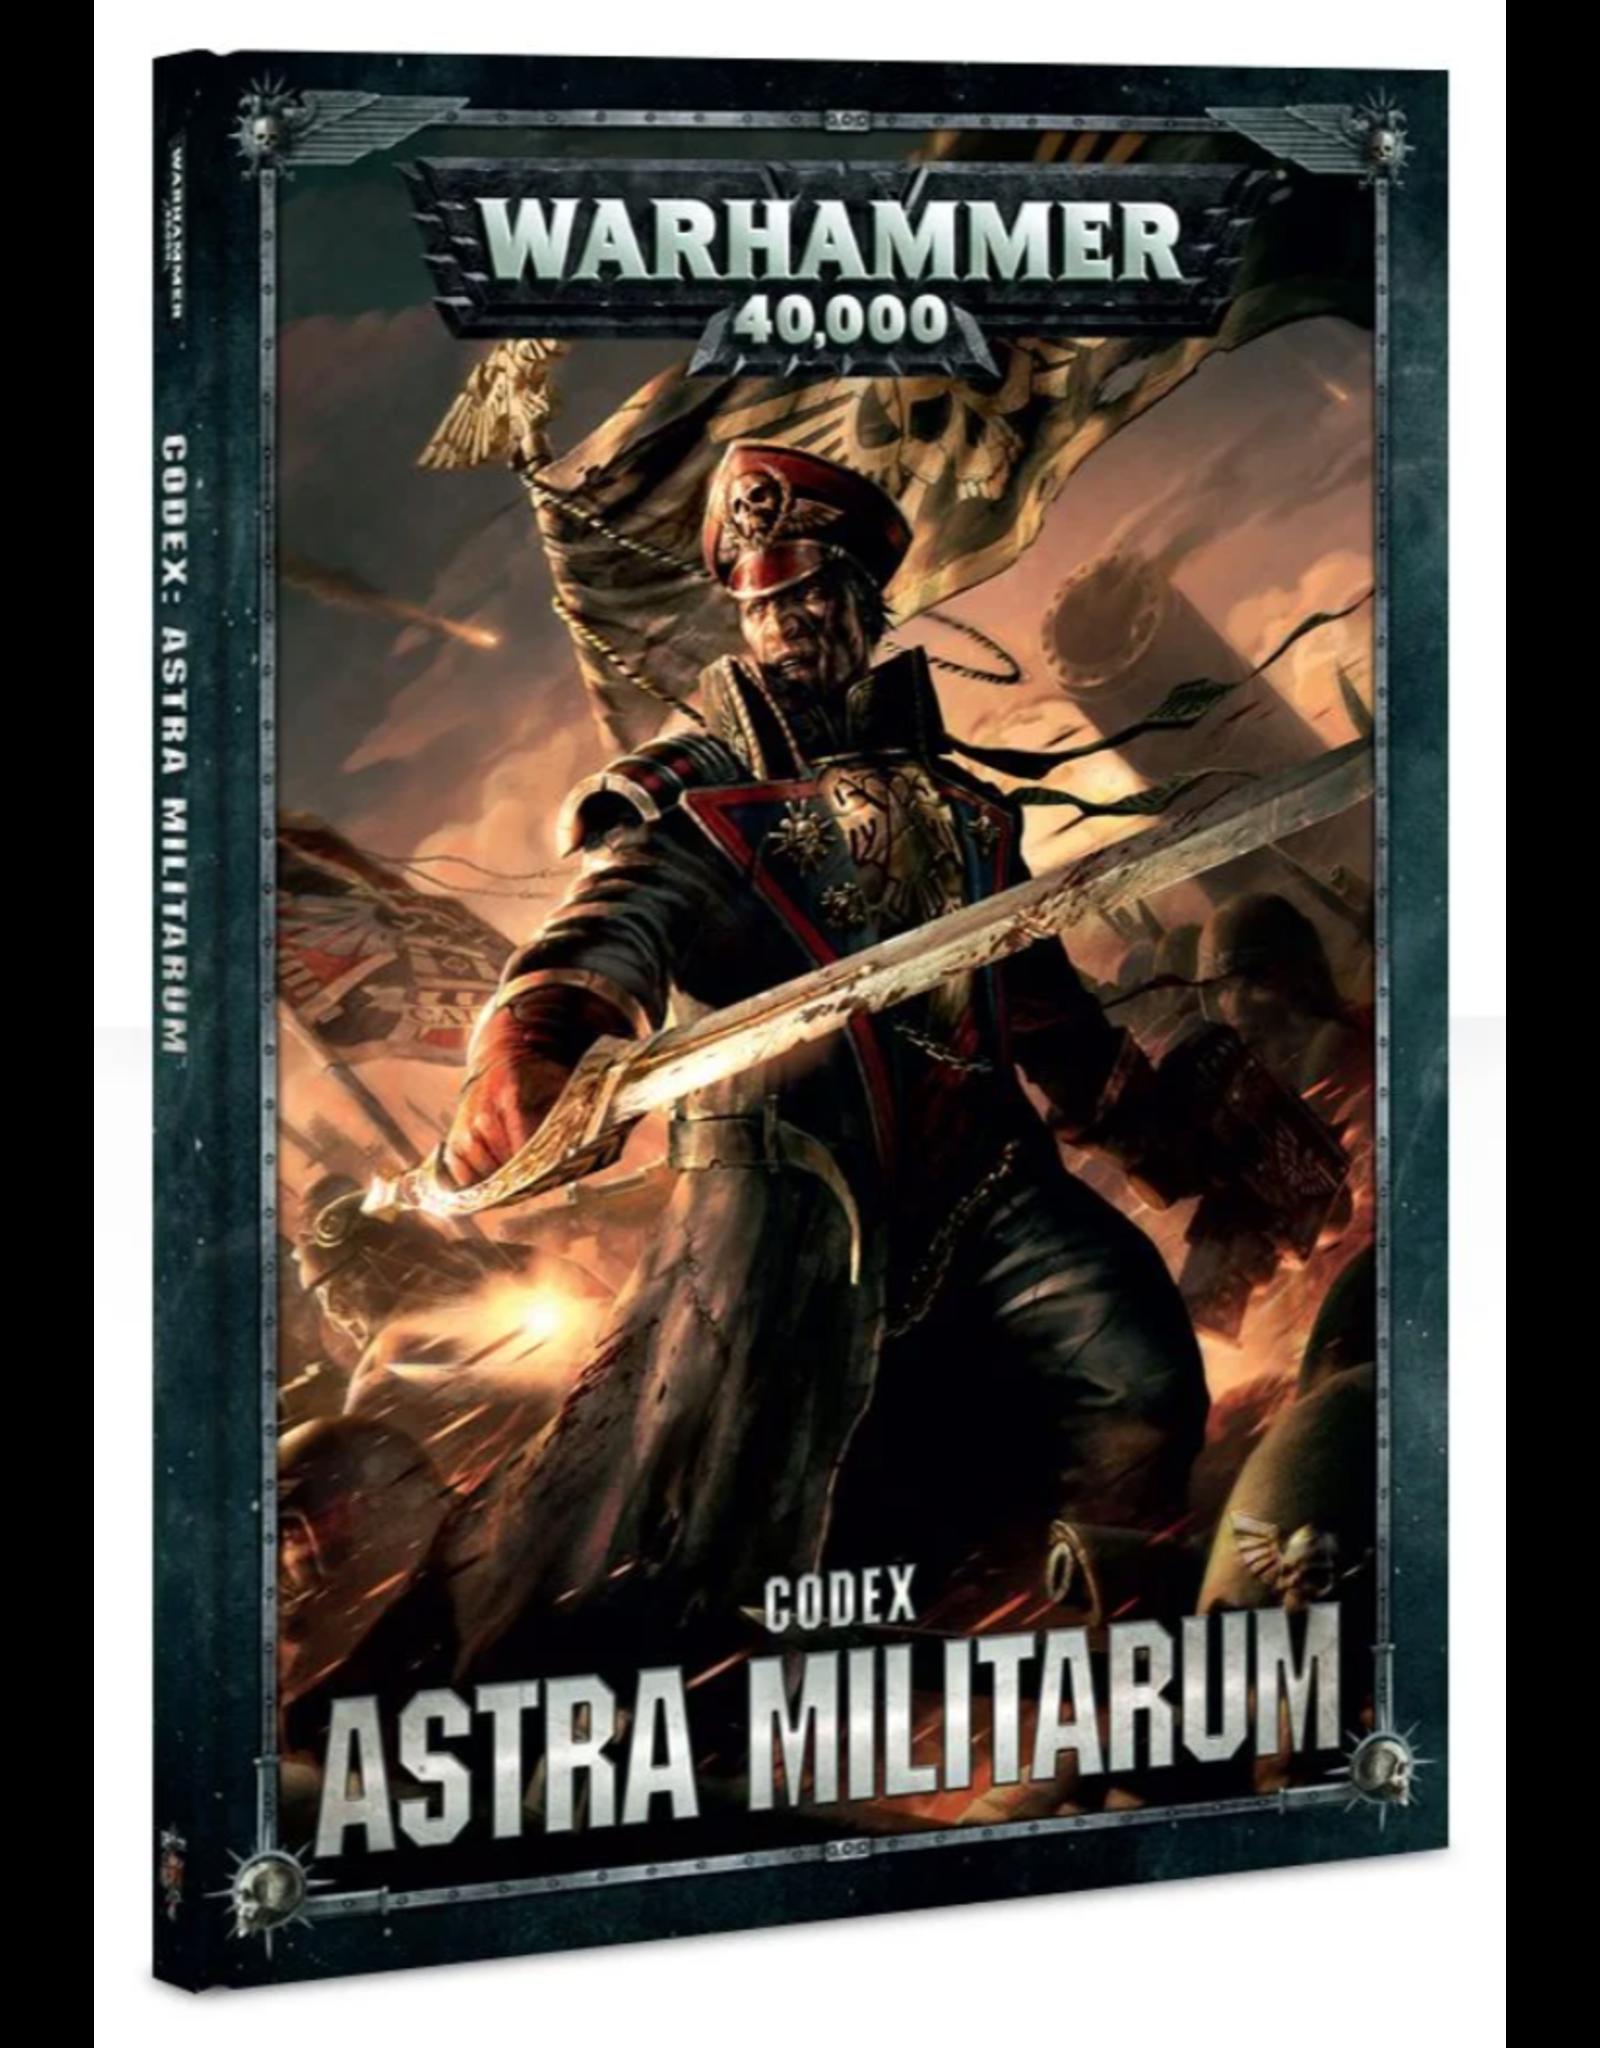 Warhammer 40K Codex: Astra Militarum